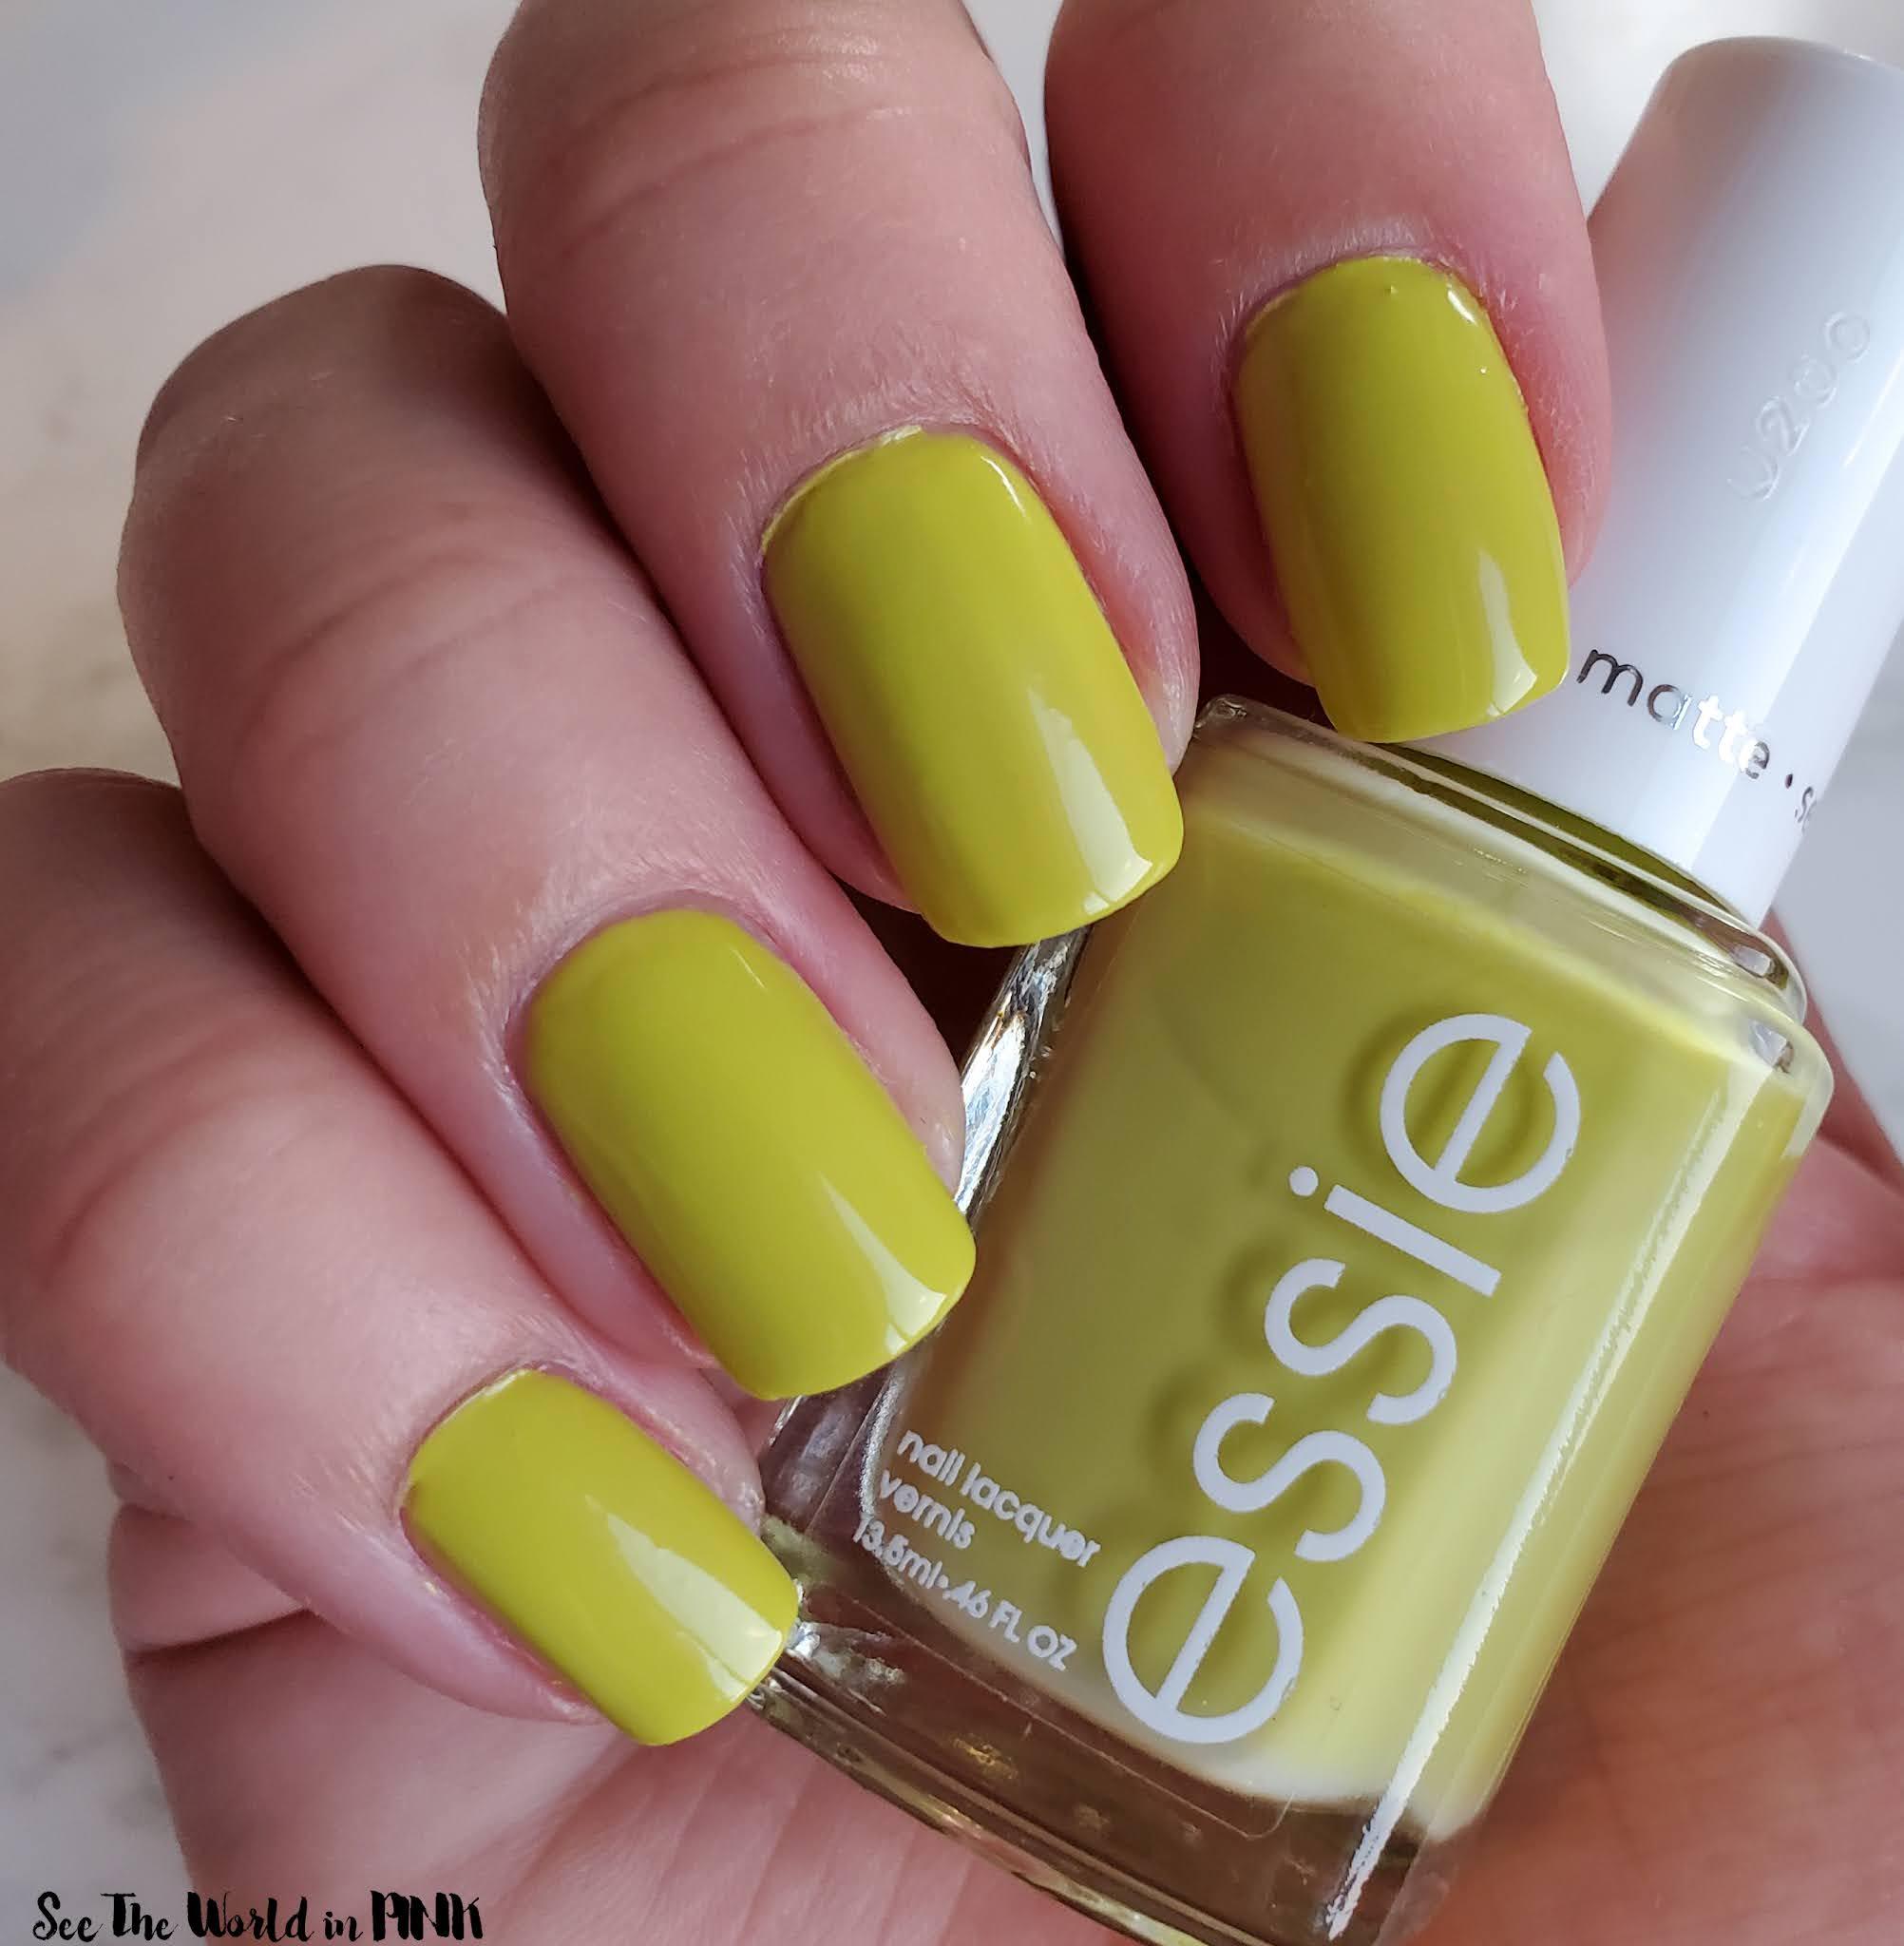 Manicure Monday - Matte Chartreuse Nails, Essie Have A Ball Polish